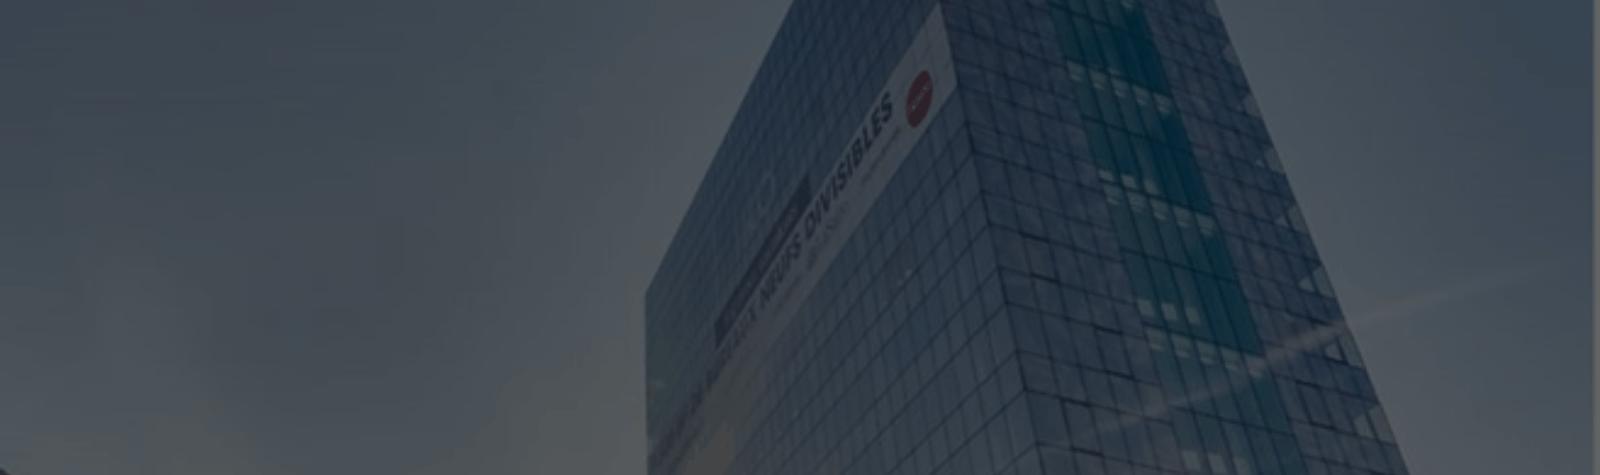 ODDO BHF acquiert l'immeuble IKO auprès de LaSalle